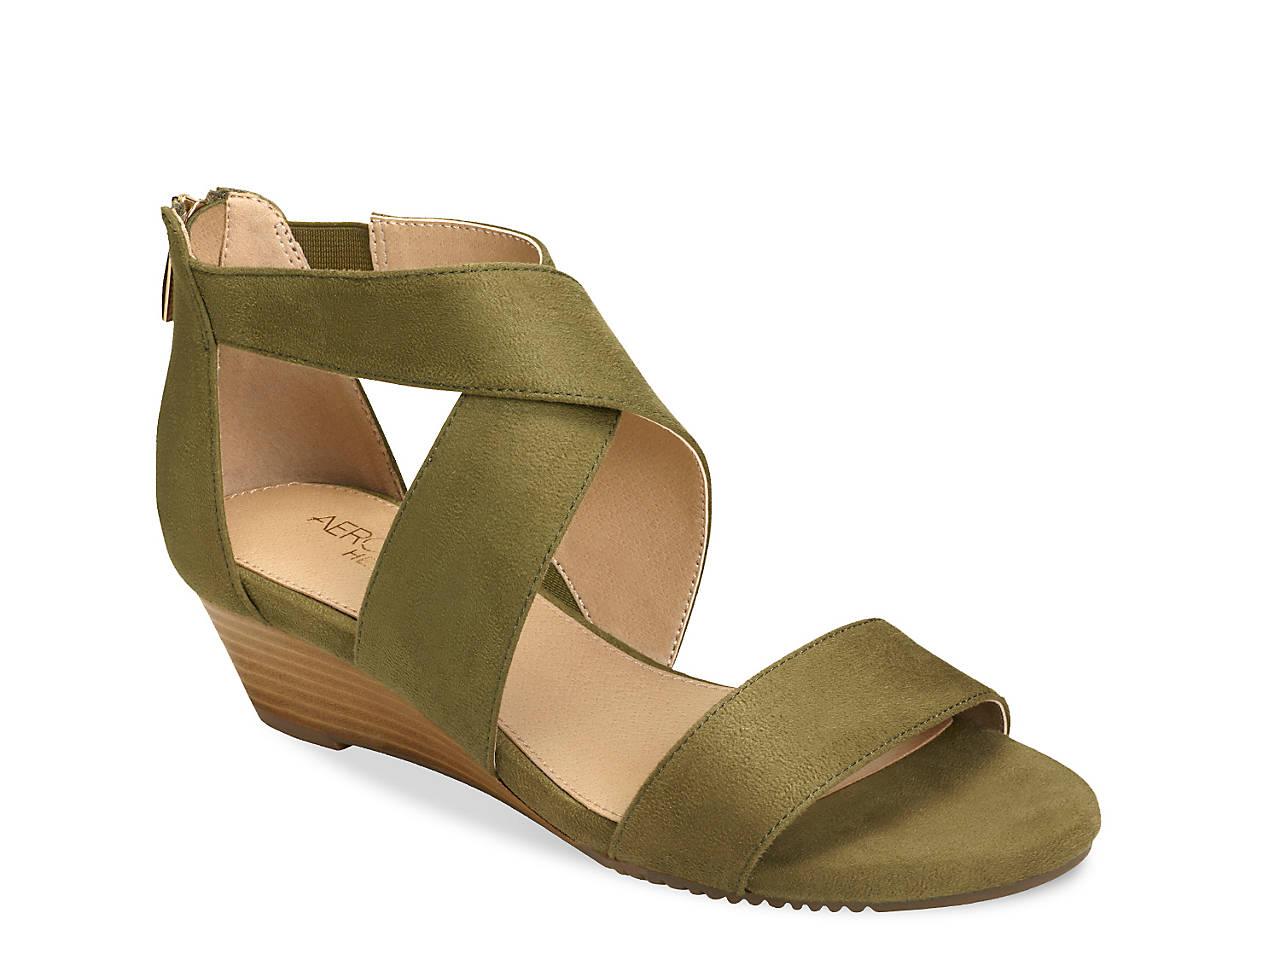 73c3ea679376e Aerosoles Apprentice Wedge Sandal Women's Shoes | DSW